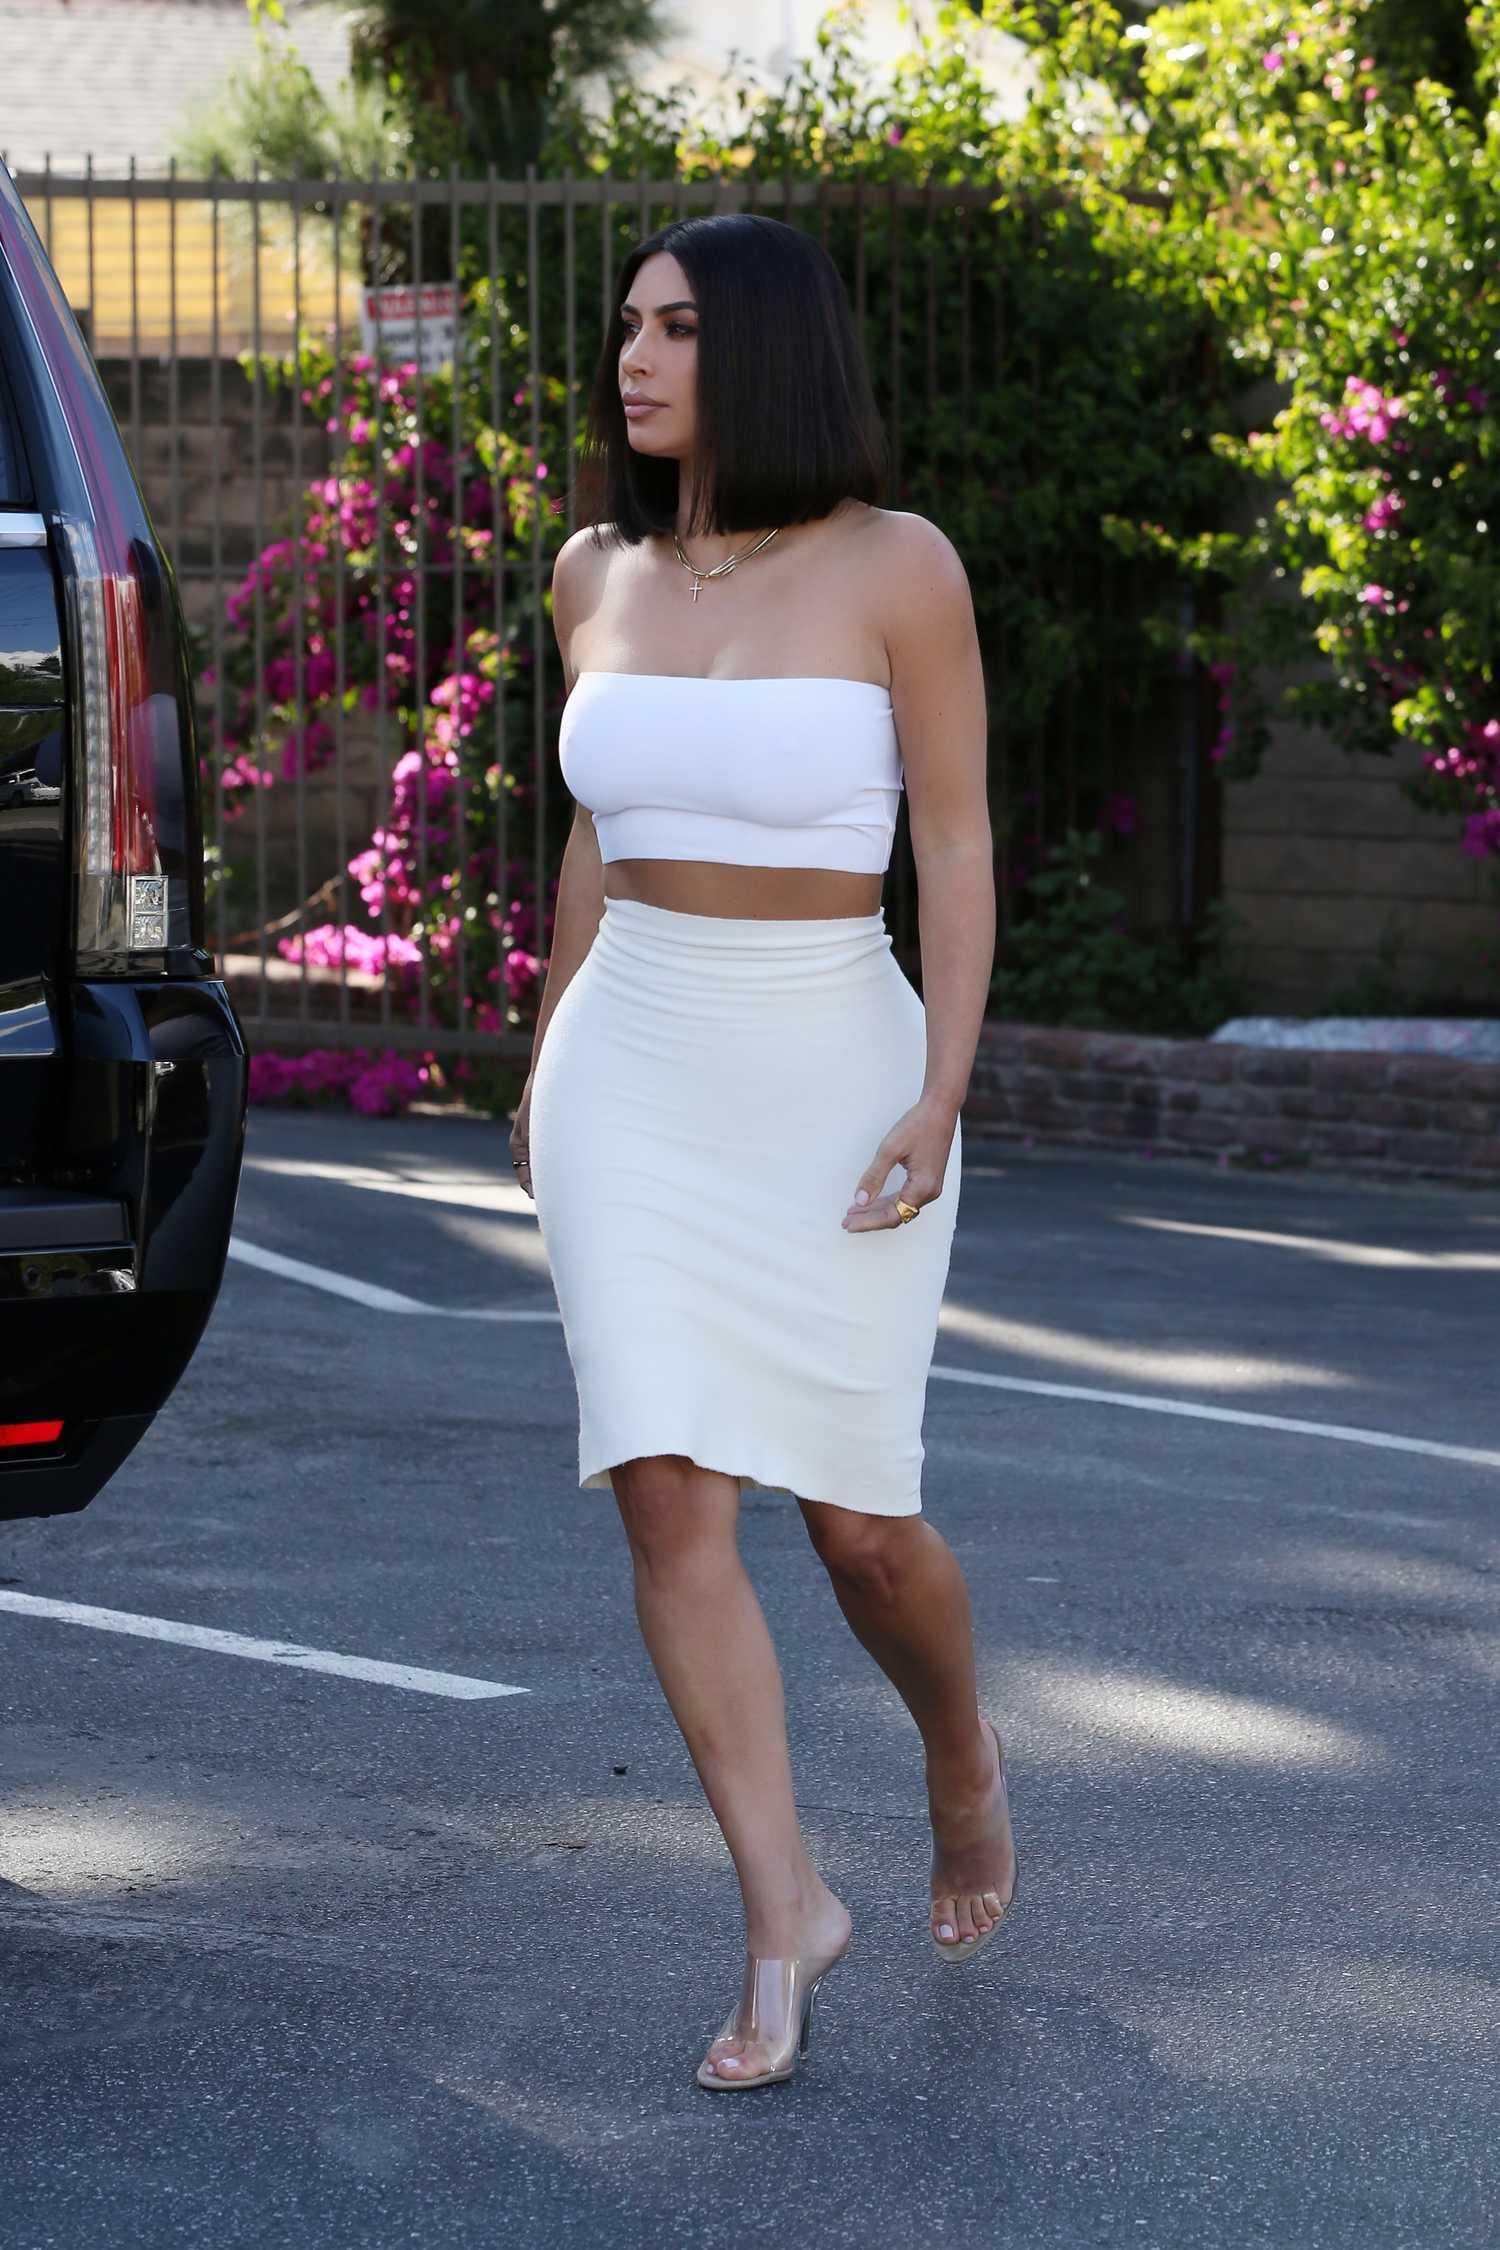 Kim Kardashian Shows Off Her New Short Bob Haircut Out In